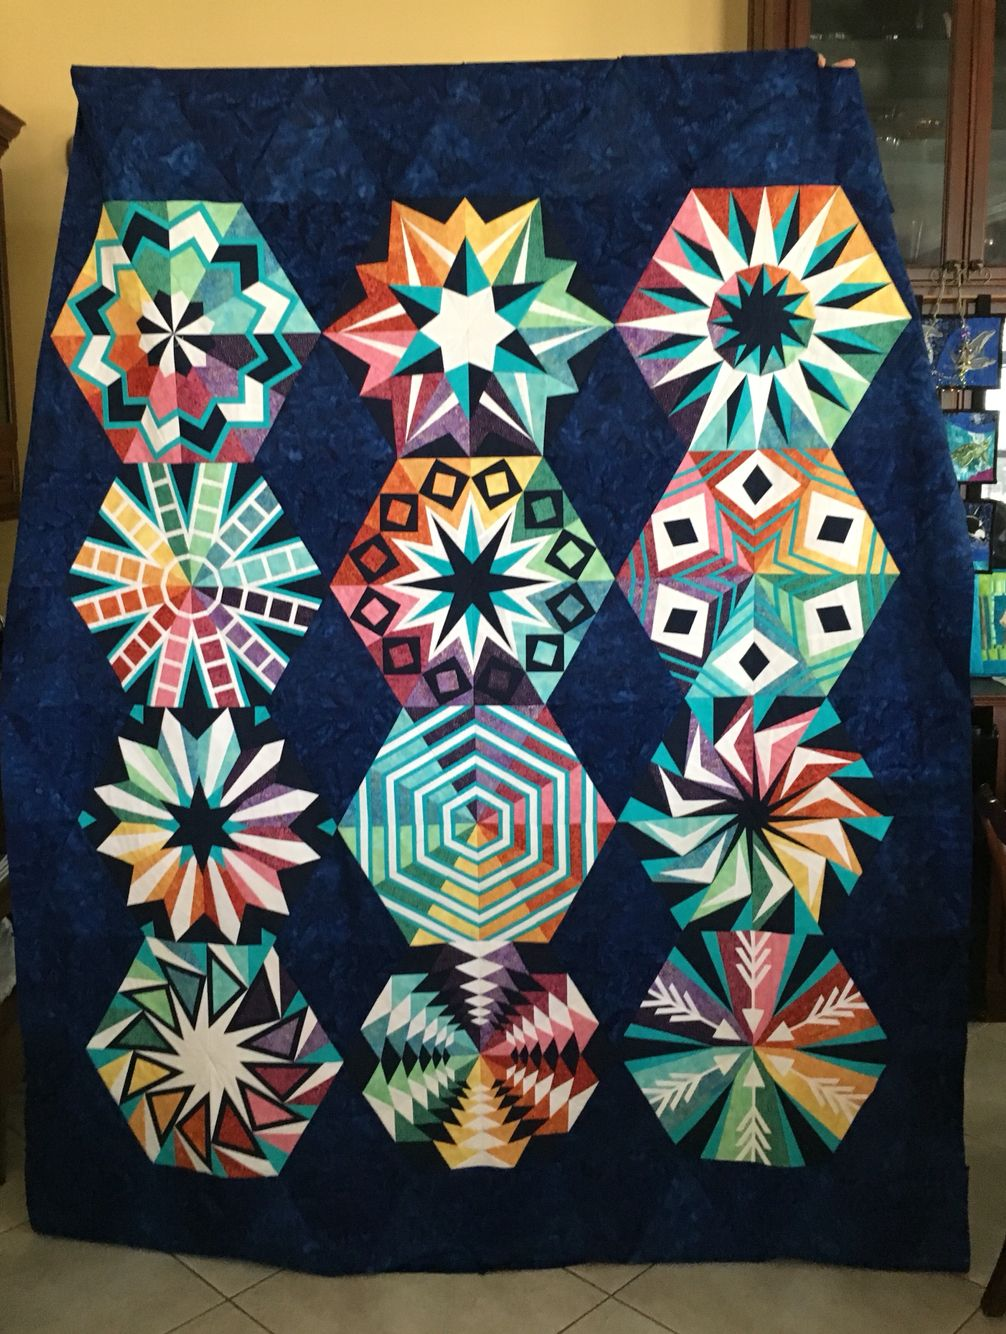 Arcadia Avenue Quilt Paper piecing | Quilt Patterns | Pinterest ... : arcadia quilt pattern - Adamdwight.com